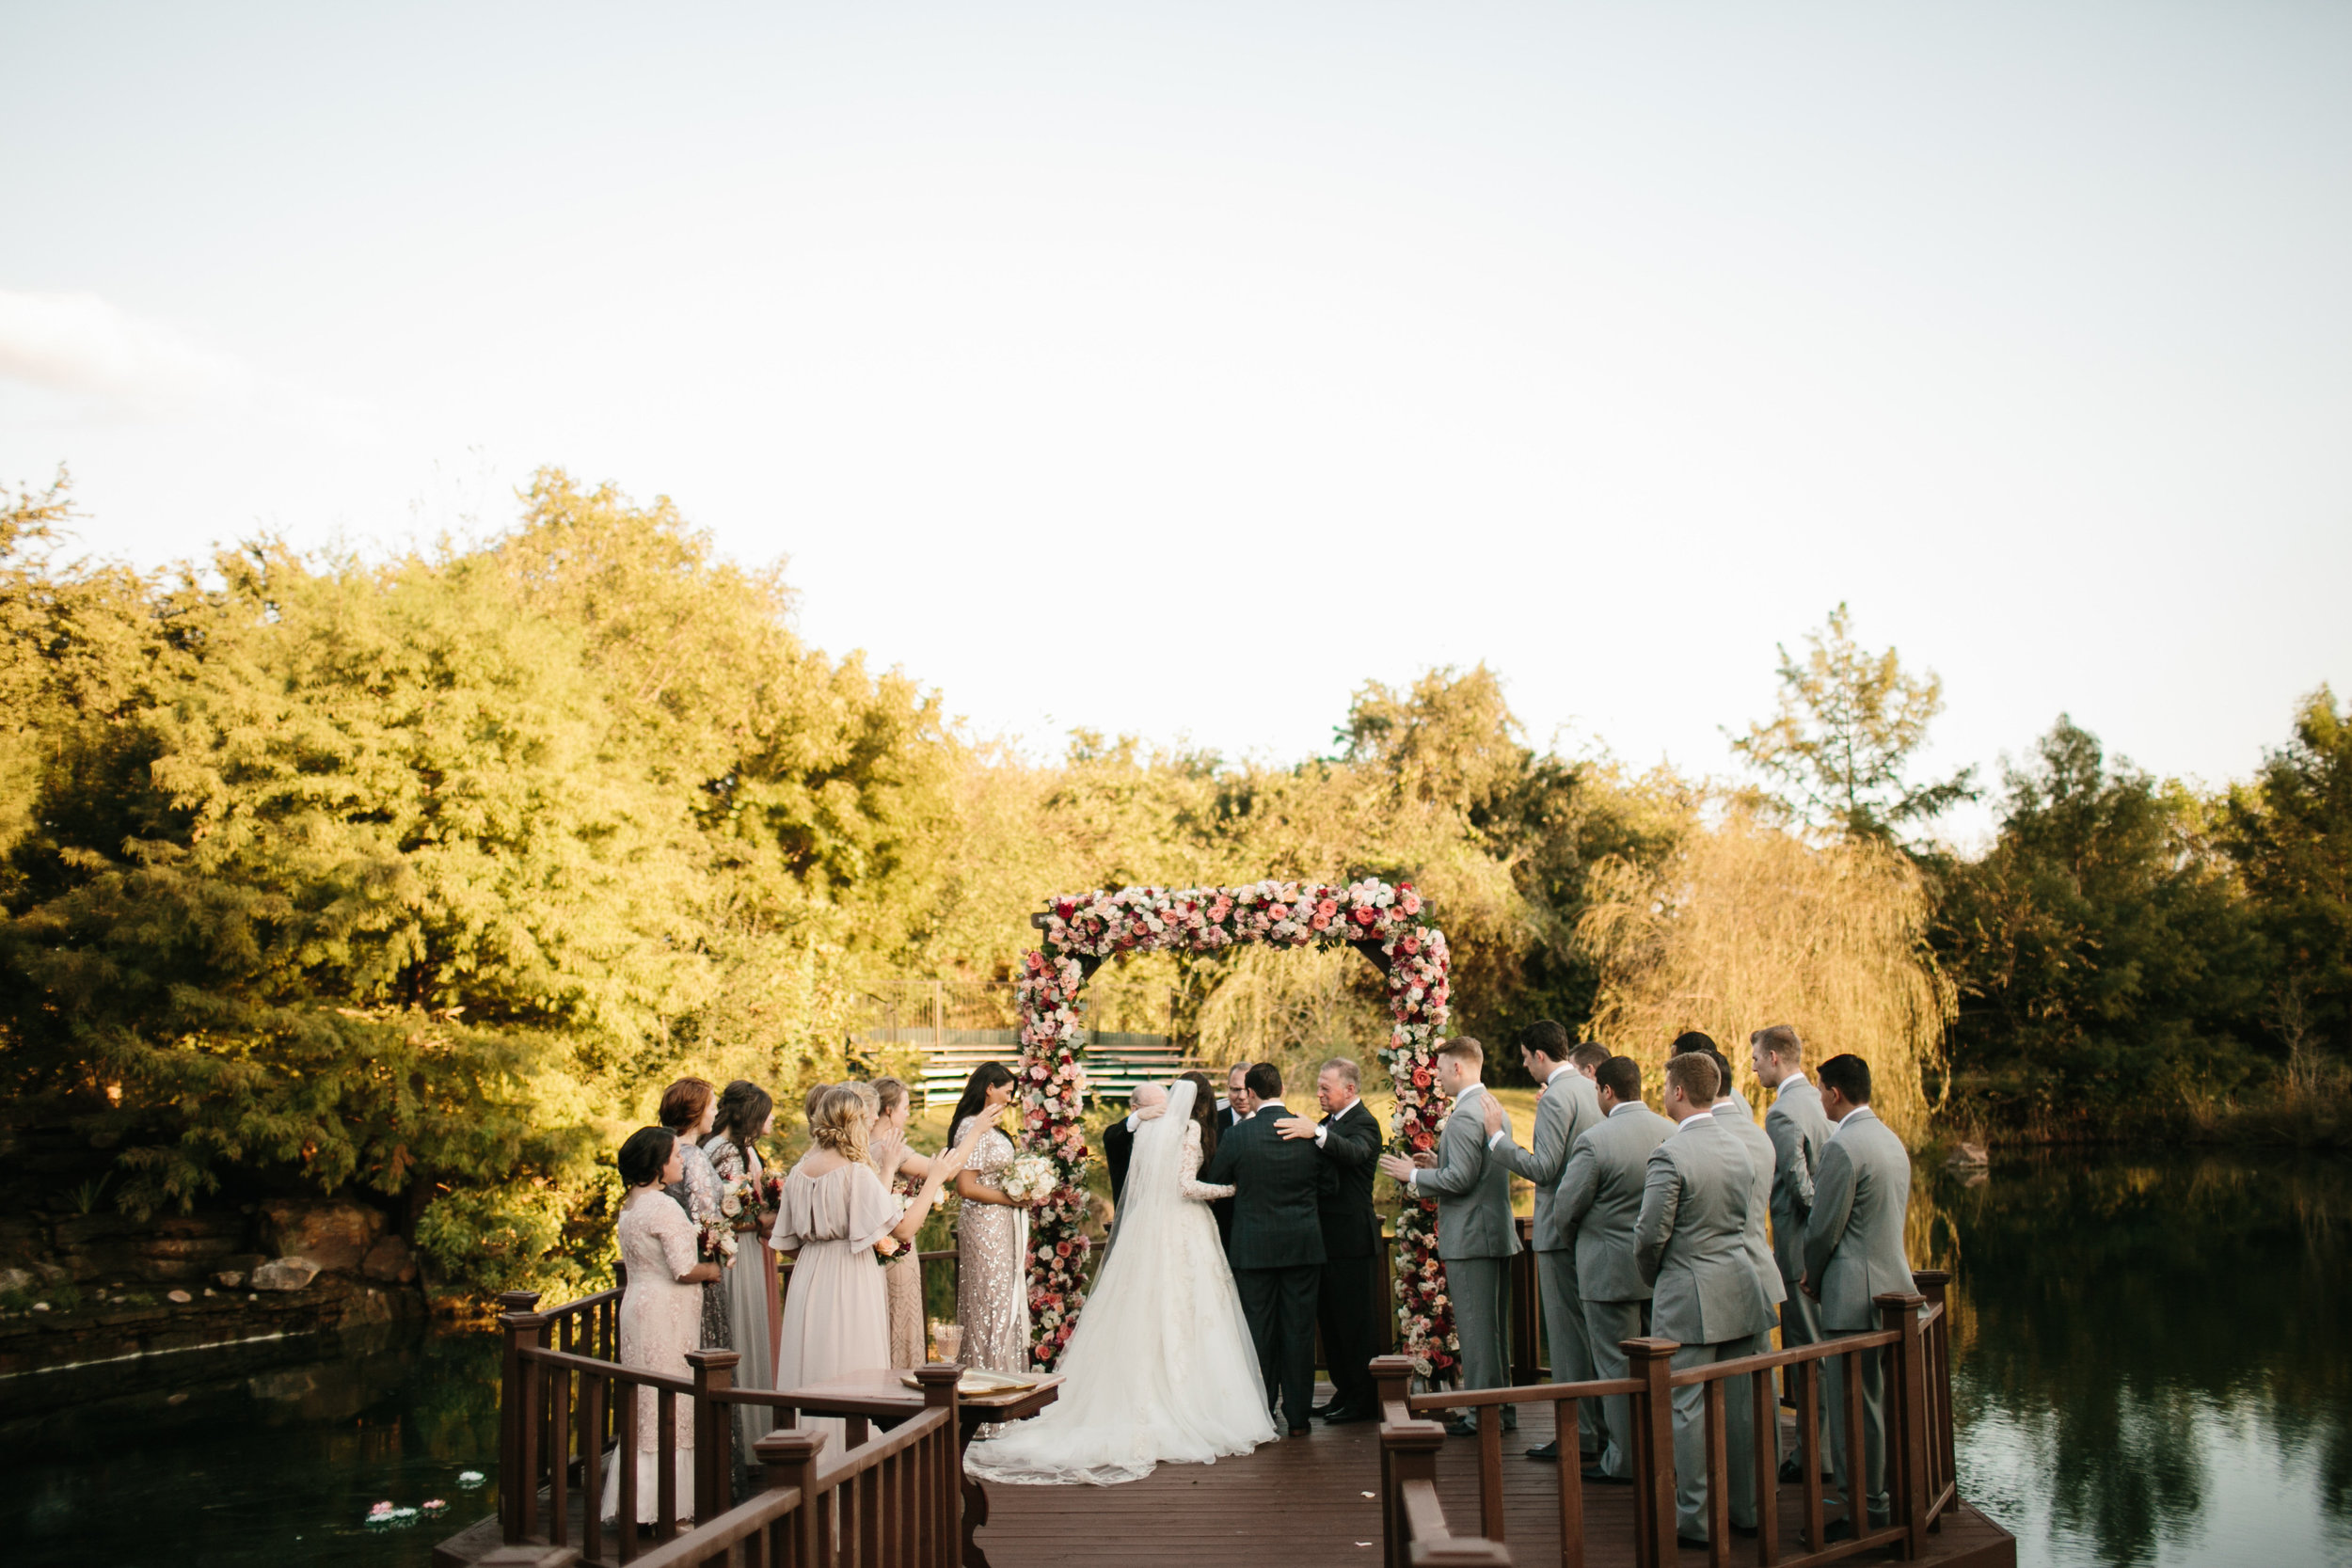 shannon_rose_rent_my_dust_fall_wedding_ (16).jpg